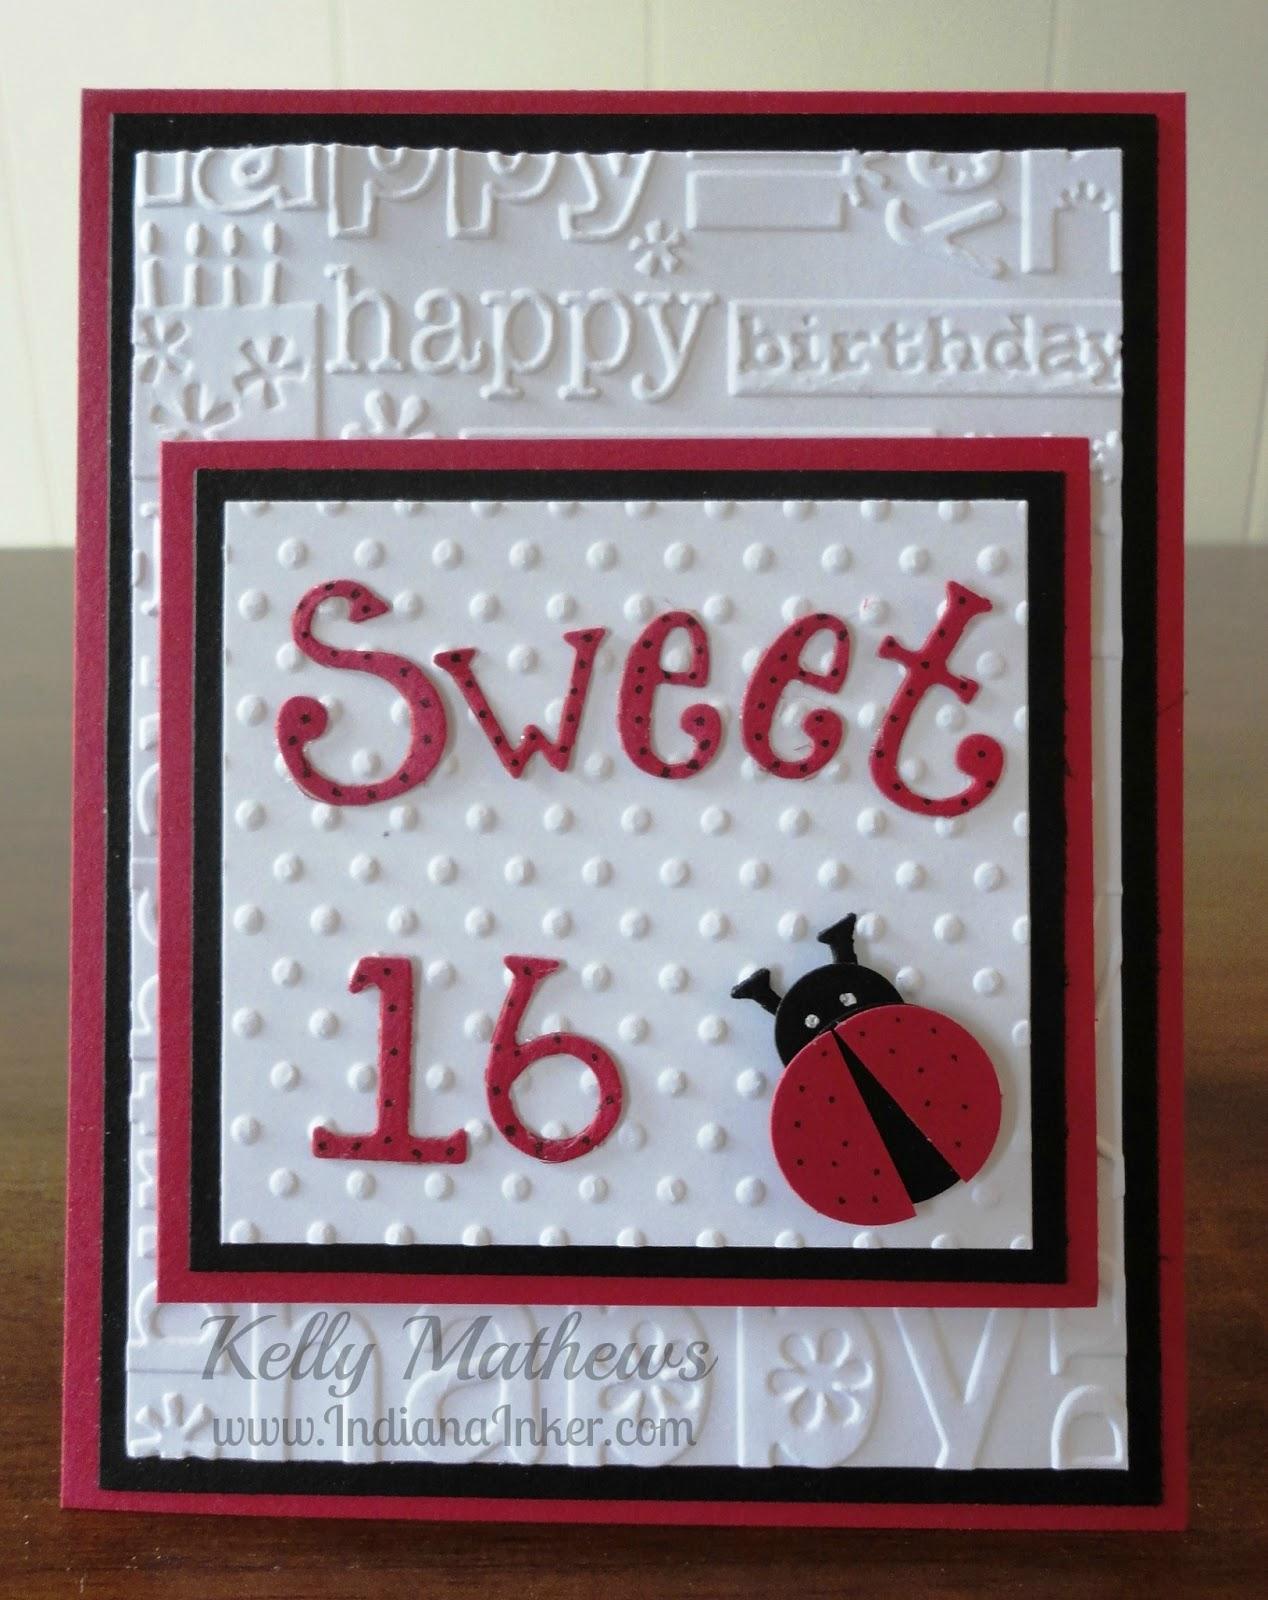 Indiana Inker Sweet 16 Ladybug Birthday Card